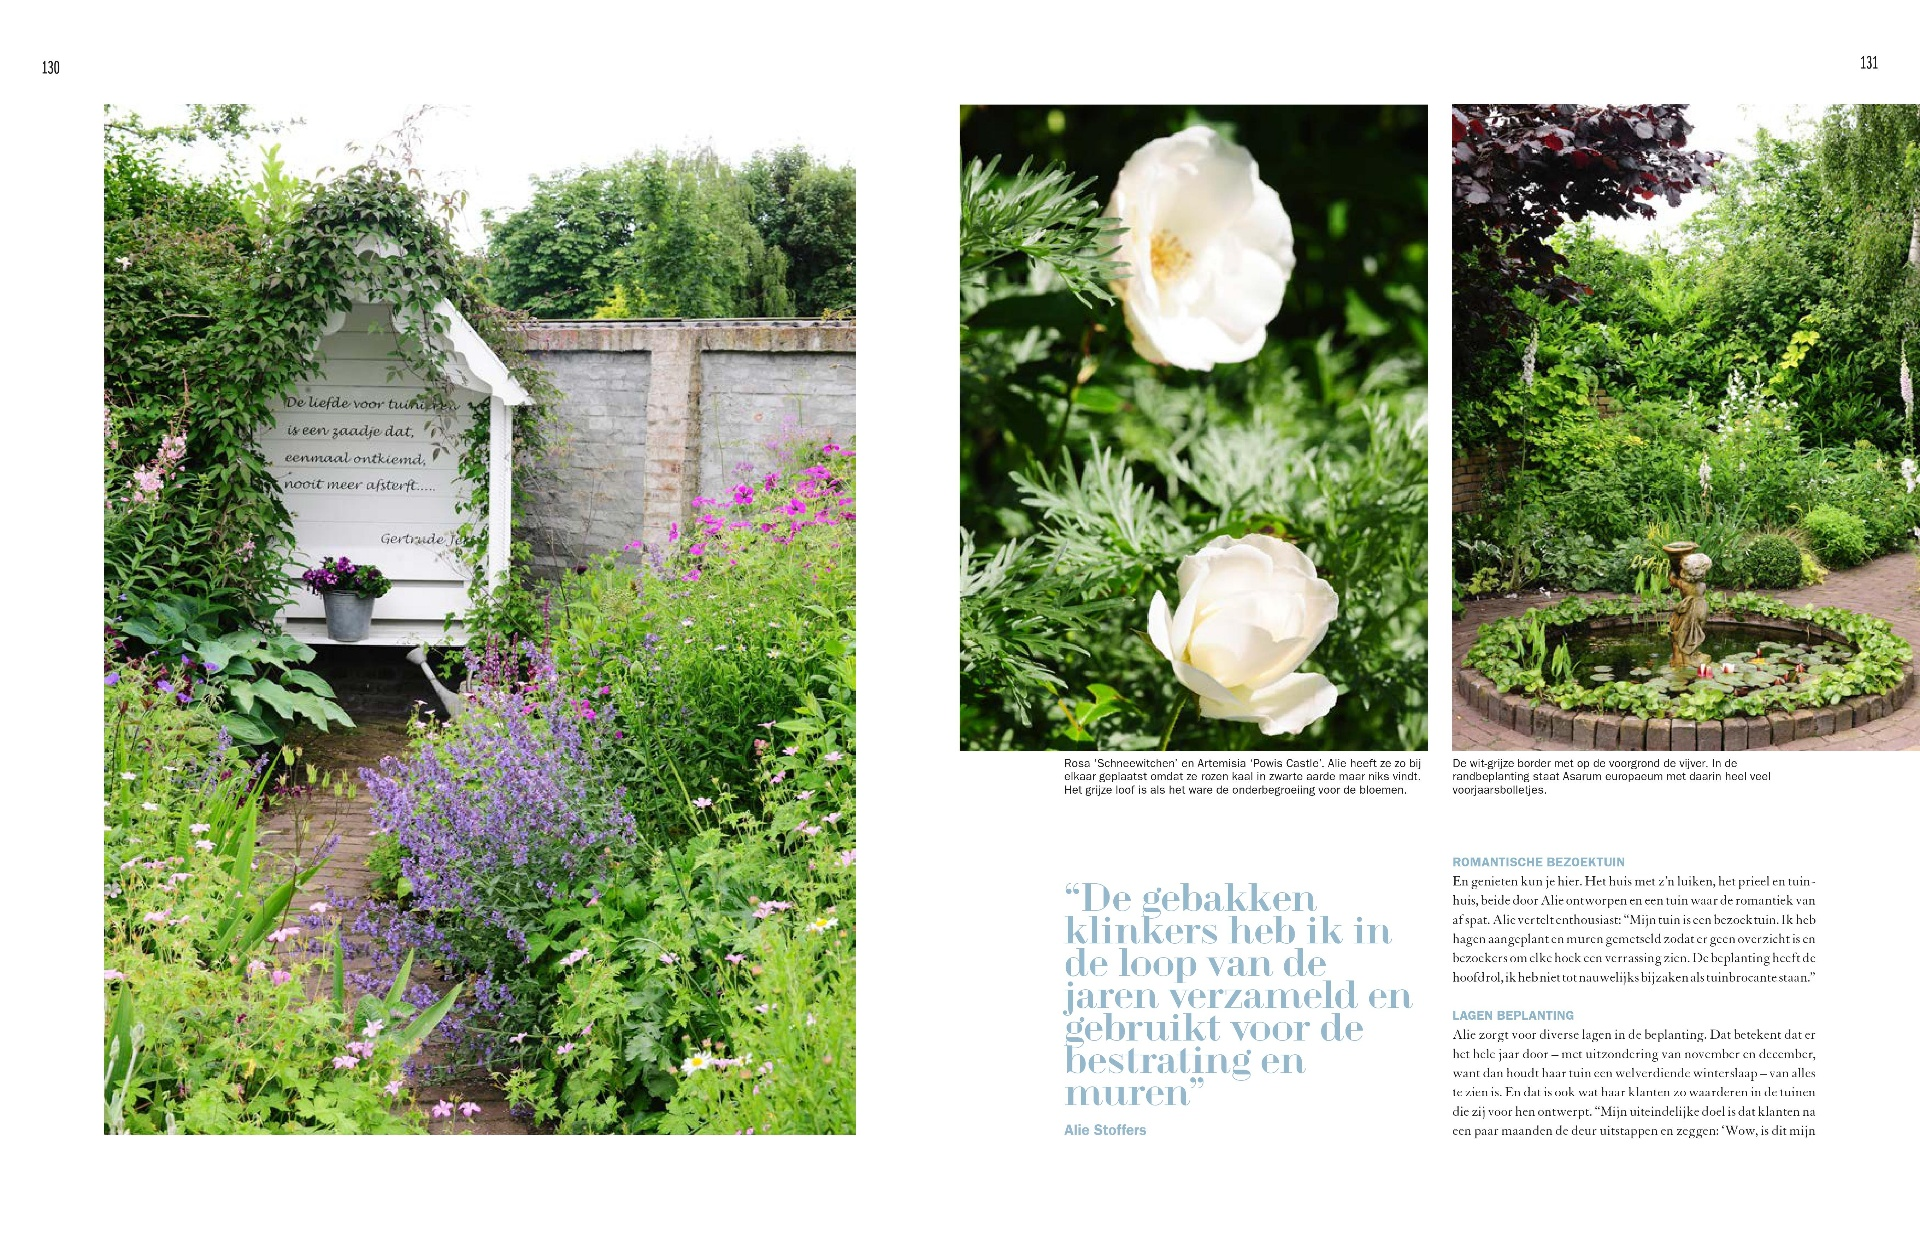 Tuinen landelijke stijl tuin landelijke stijl with tuinen